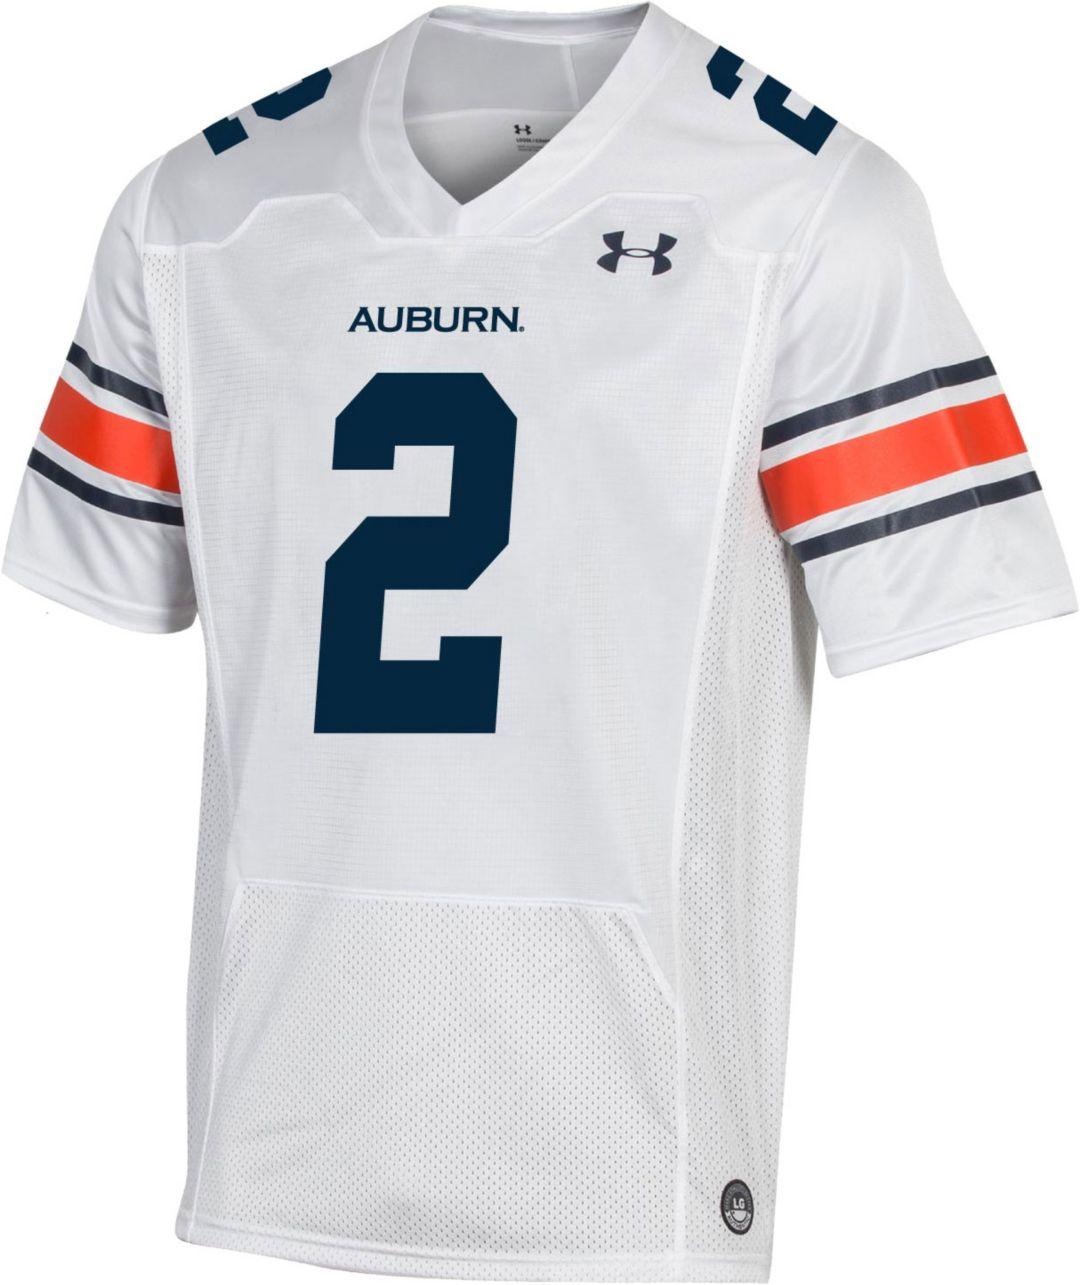 Under Armour Men S Auburn Tigers 2 Replica Football White Jersey